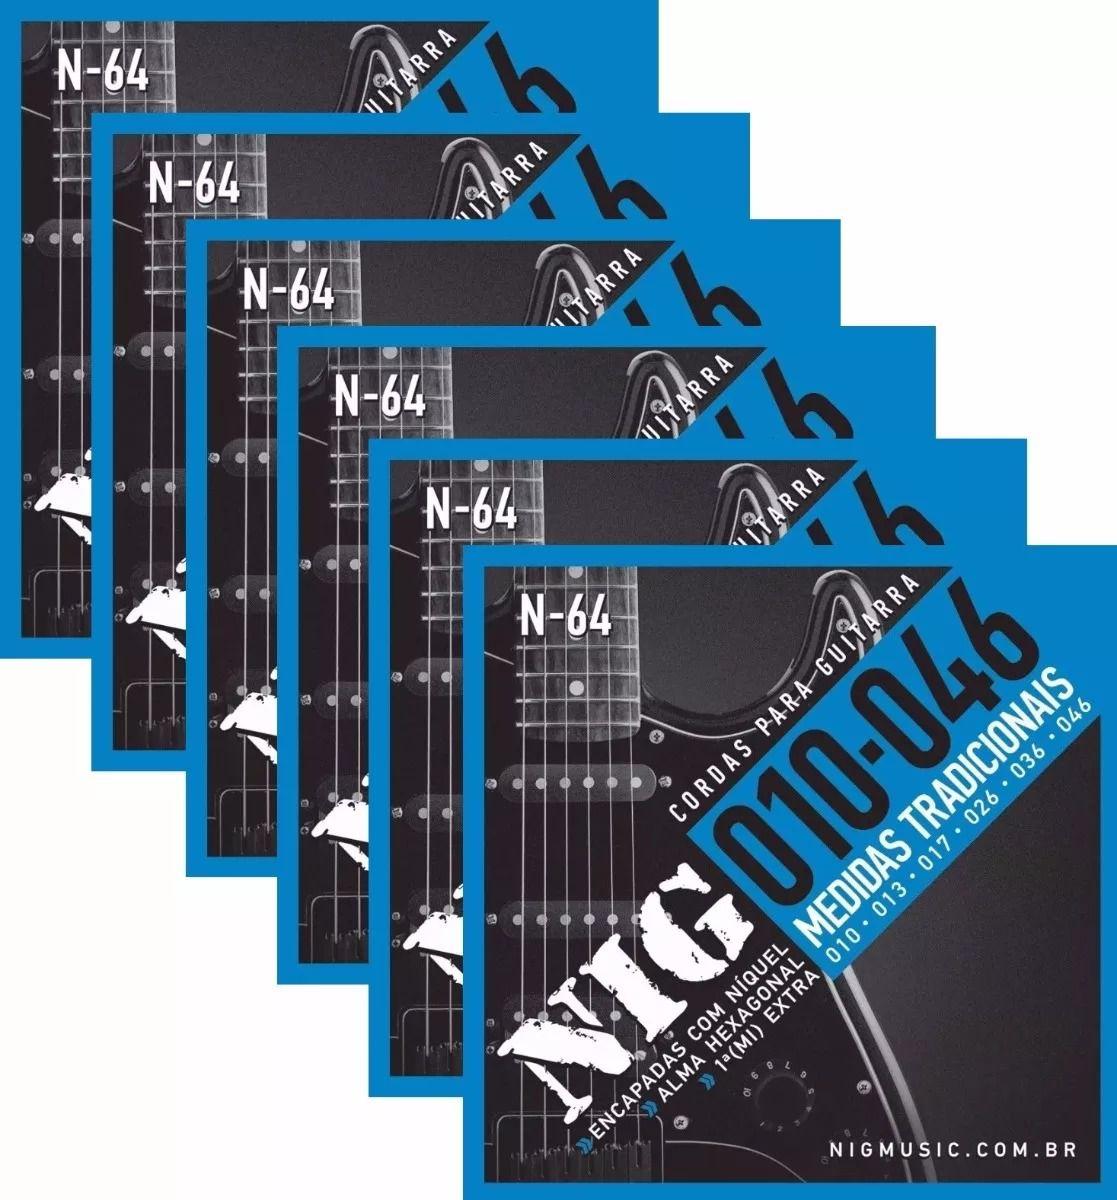 Kit 6 Jogos Encordoamento Nig Guitarra 010 046 N64 N-64